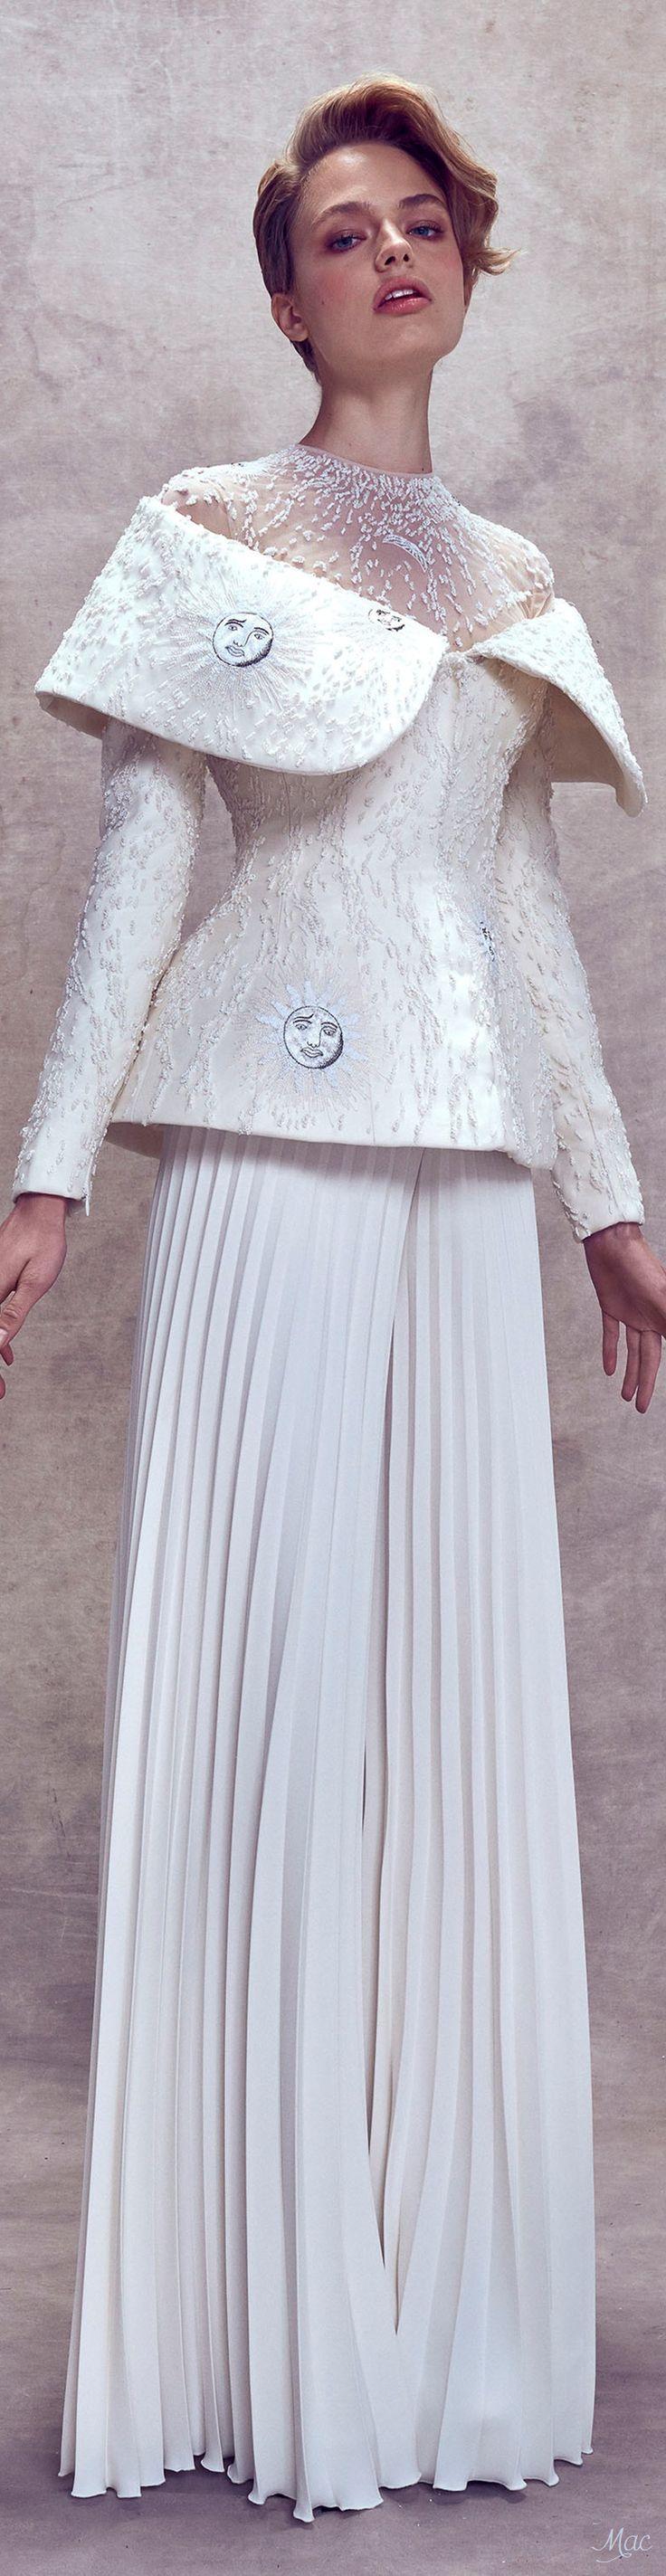 Fall 2017 Haute Couture Ashi Studio